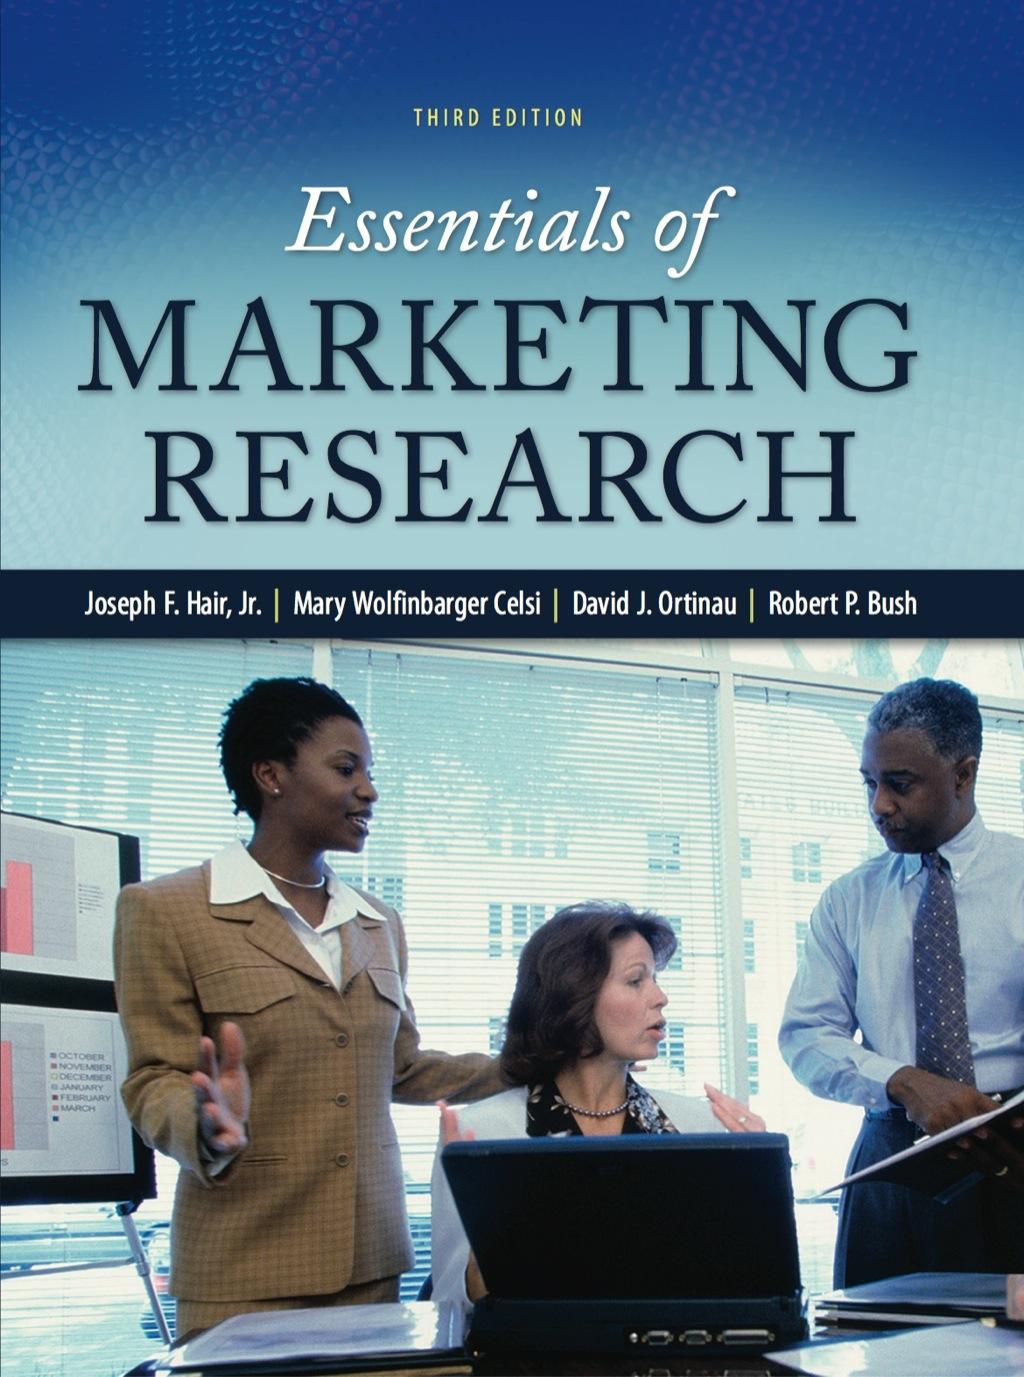 Essentials of Marketing Research (eBook Rental)